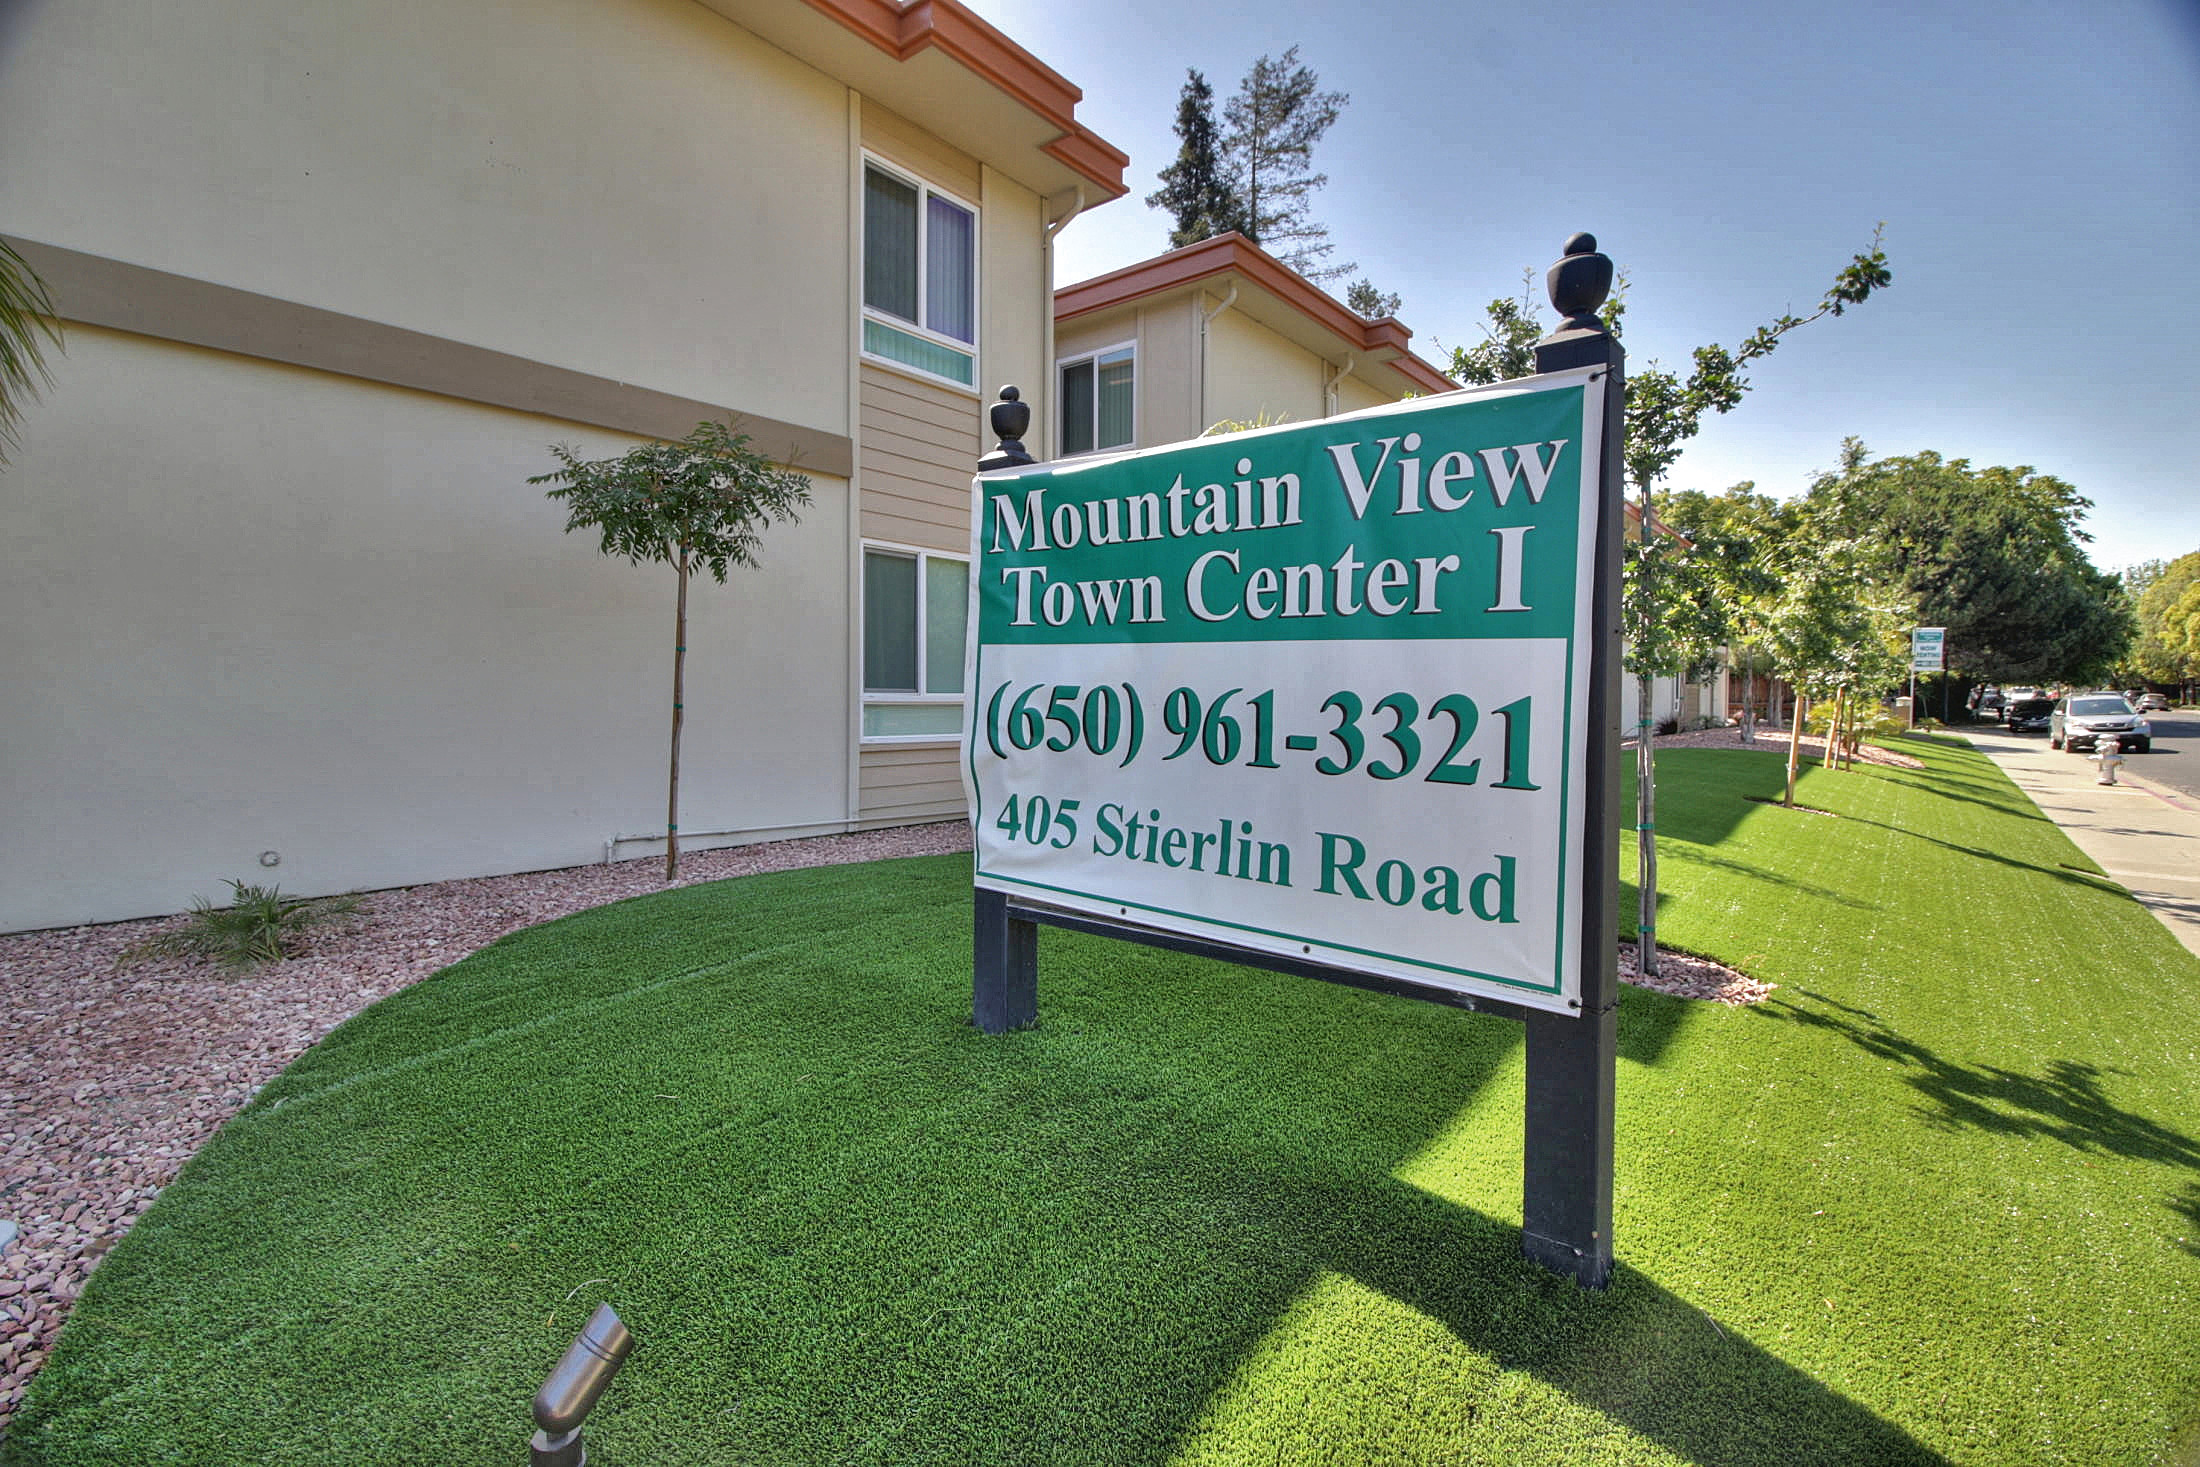 Mountain View Photo Gallery 1